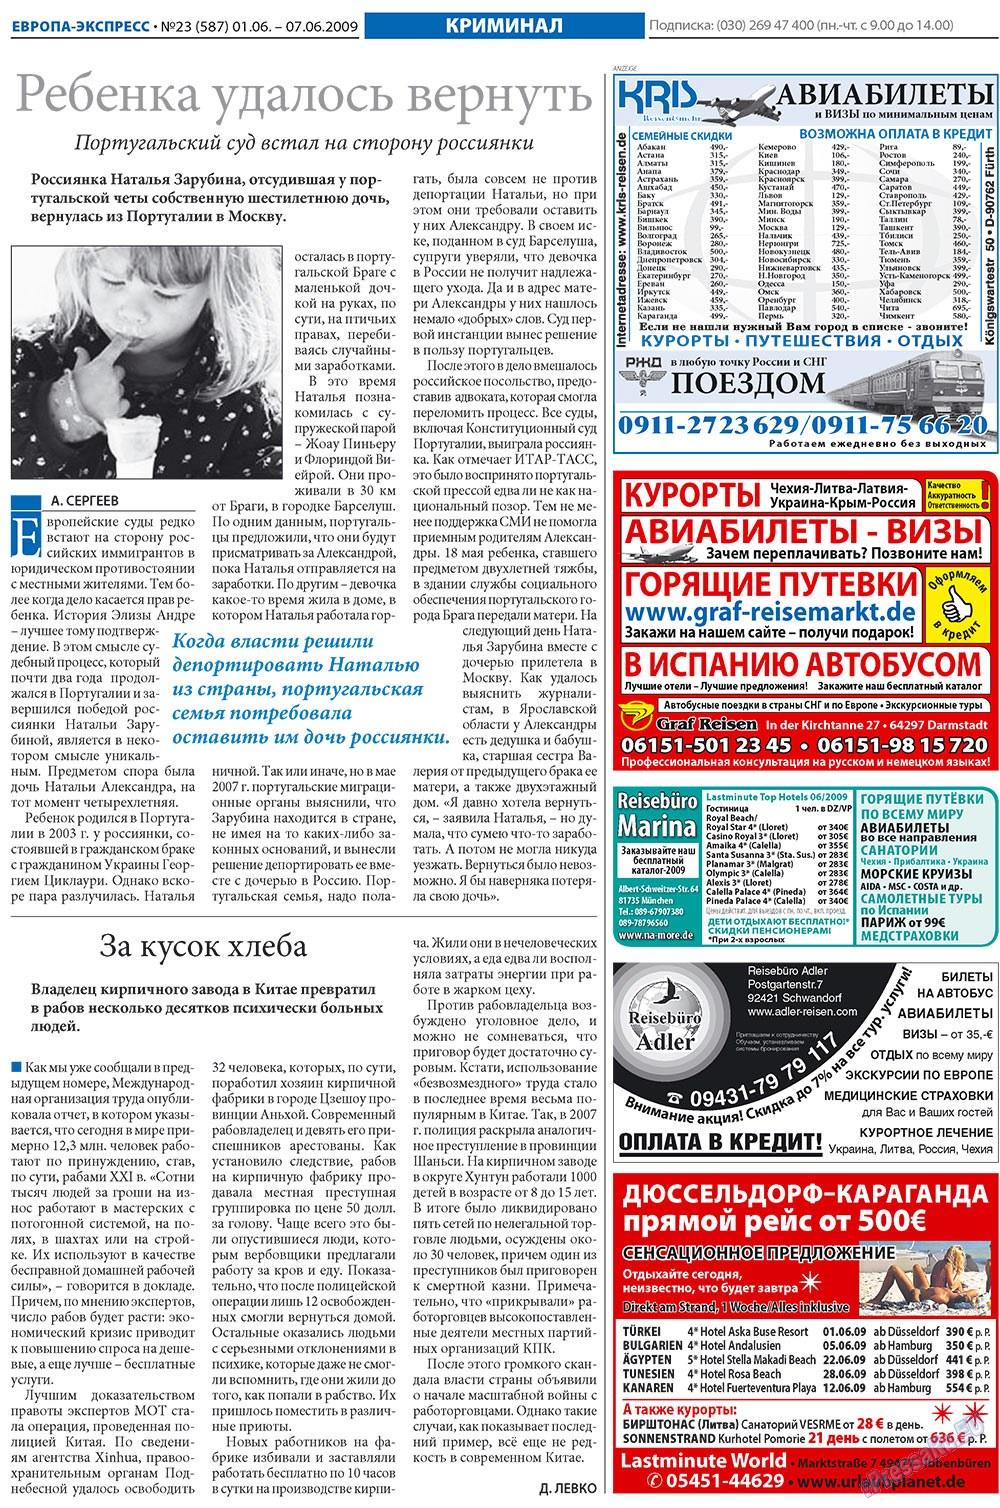 Европа экспресс (газета). 2009 год, номер 23, стр. 19